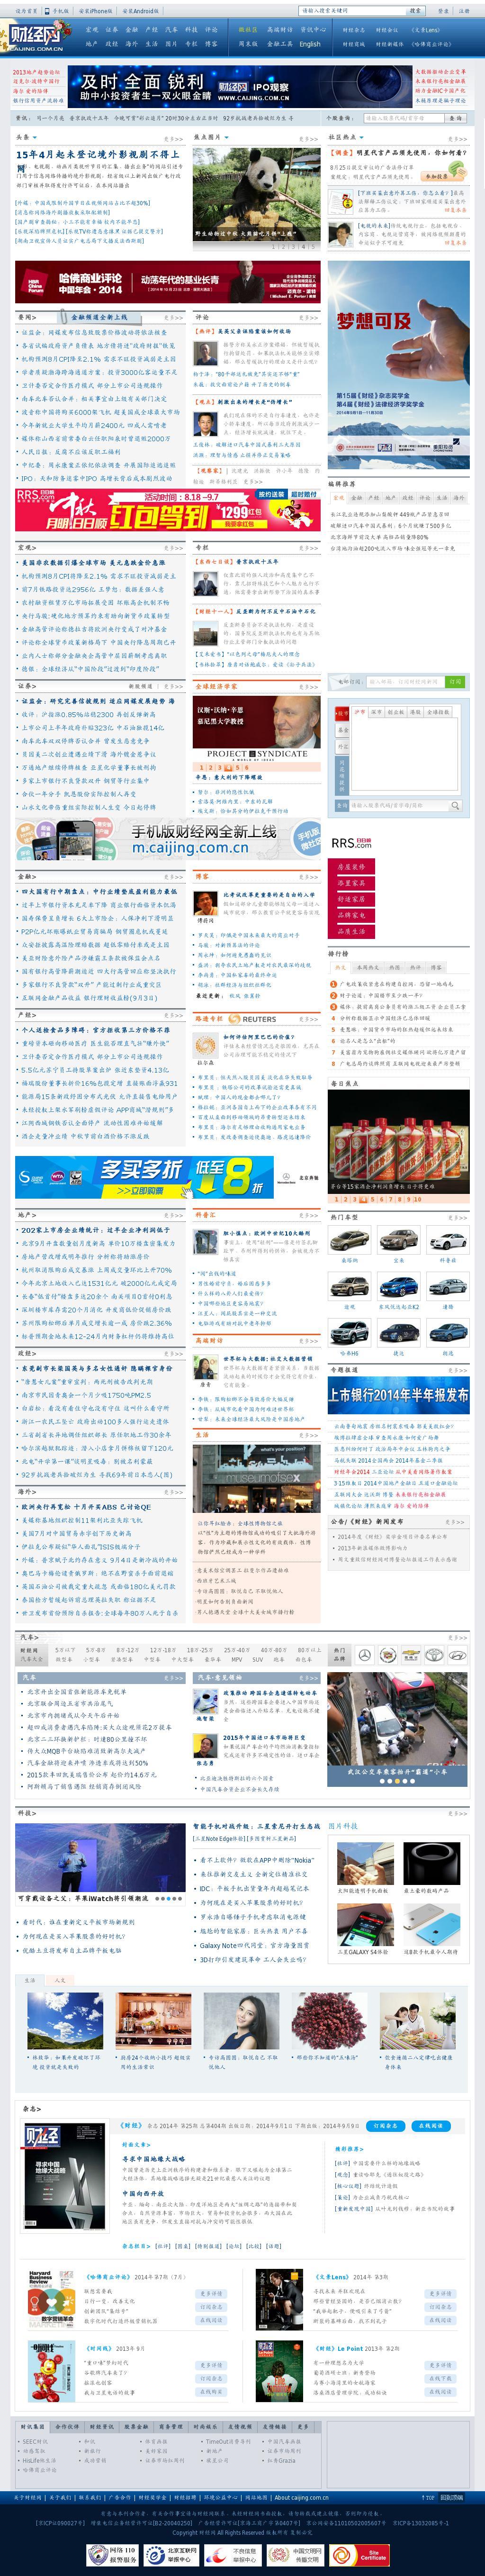 Caijing at Monday Sept. 8, 2014, 5:01 a.m. UTC